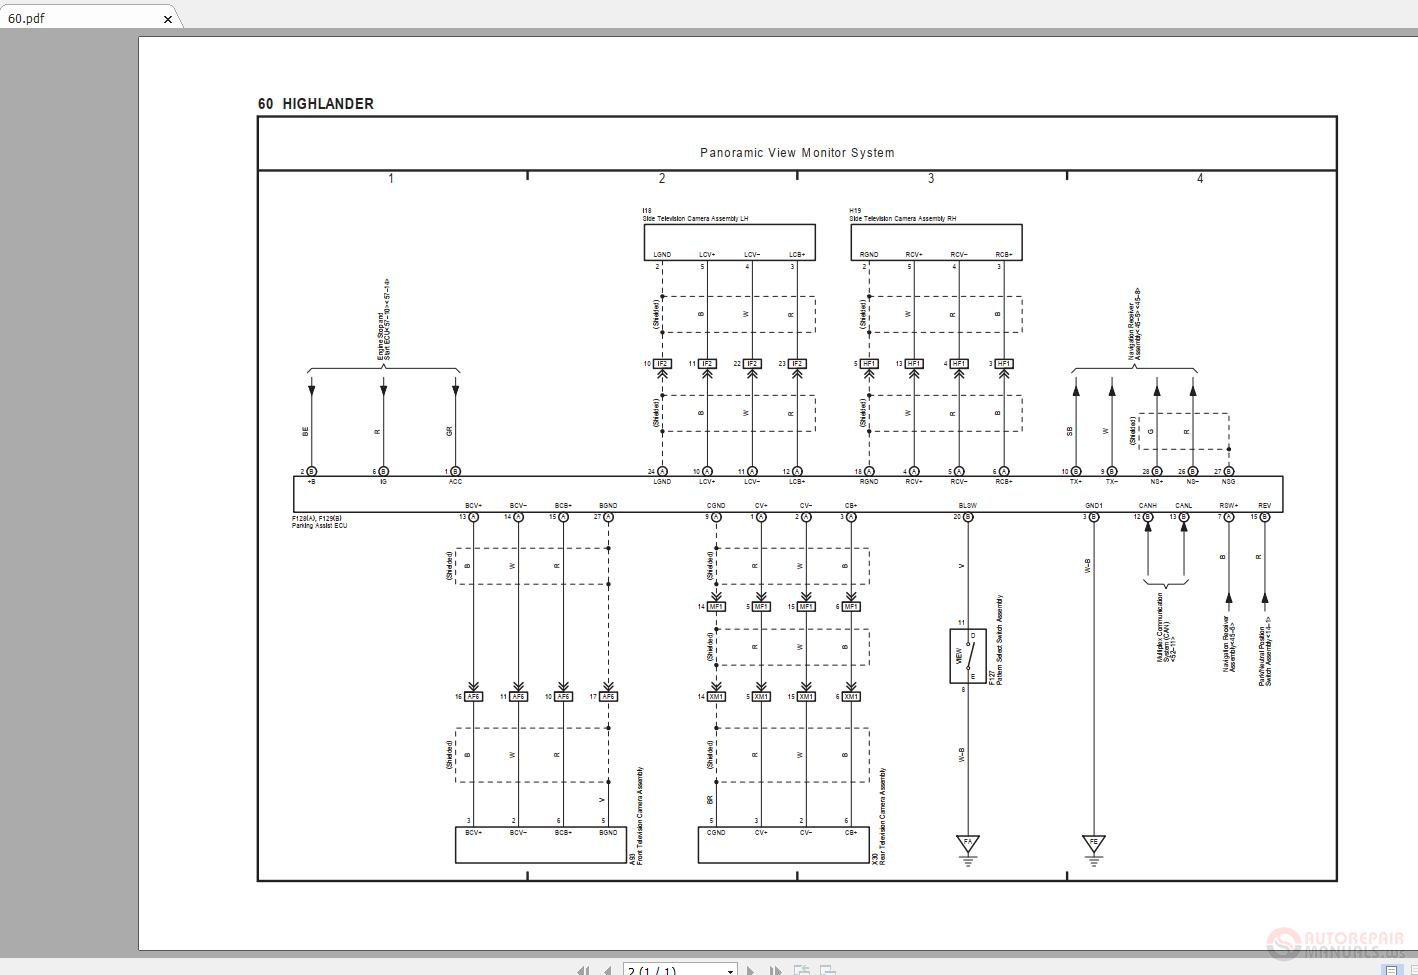 Toyota Highlander Wiring - Catalogue of Schemas on